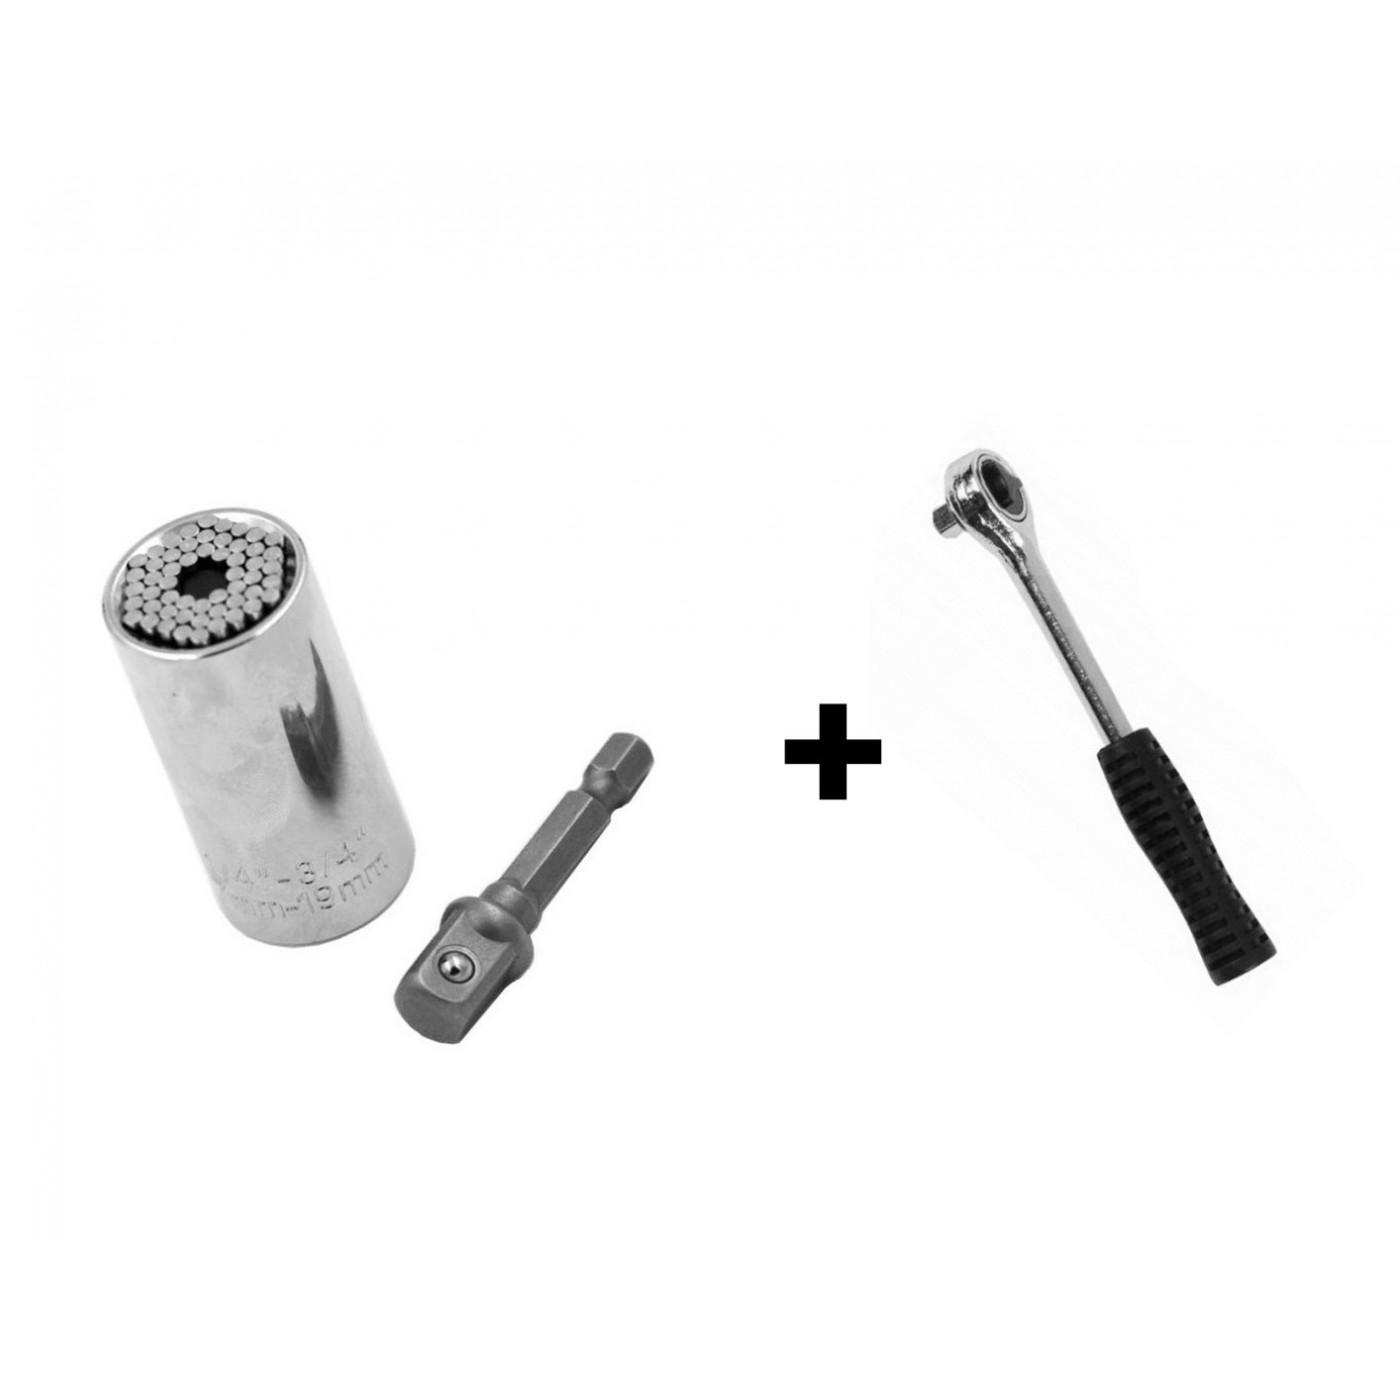 Set: gator grip 7-19mm (universal wrench plus ratchet)